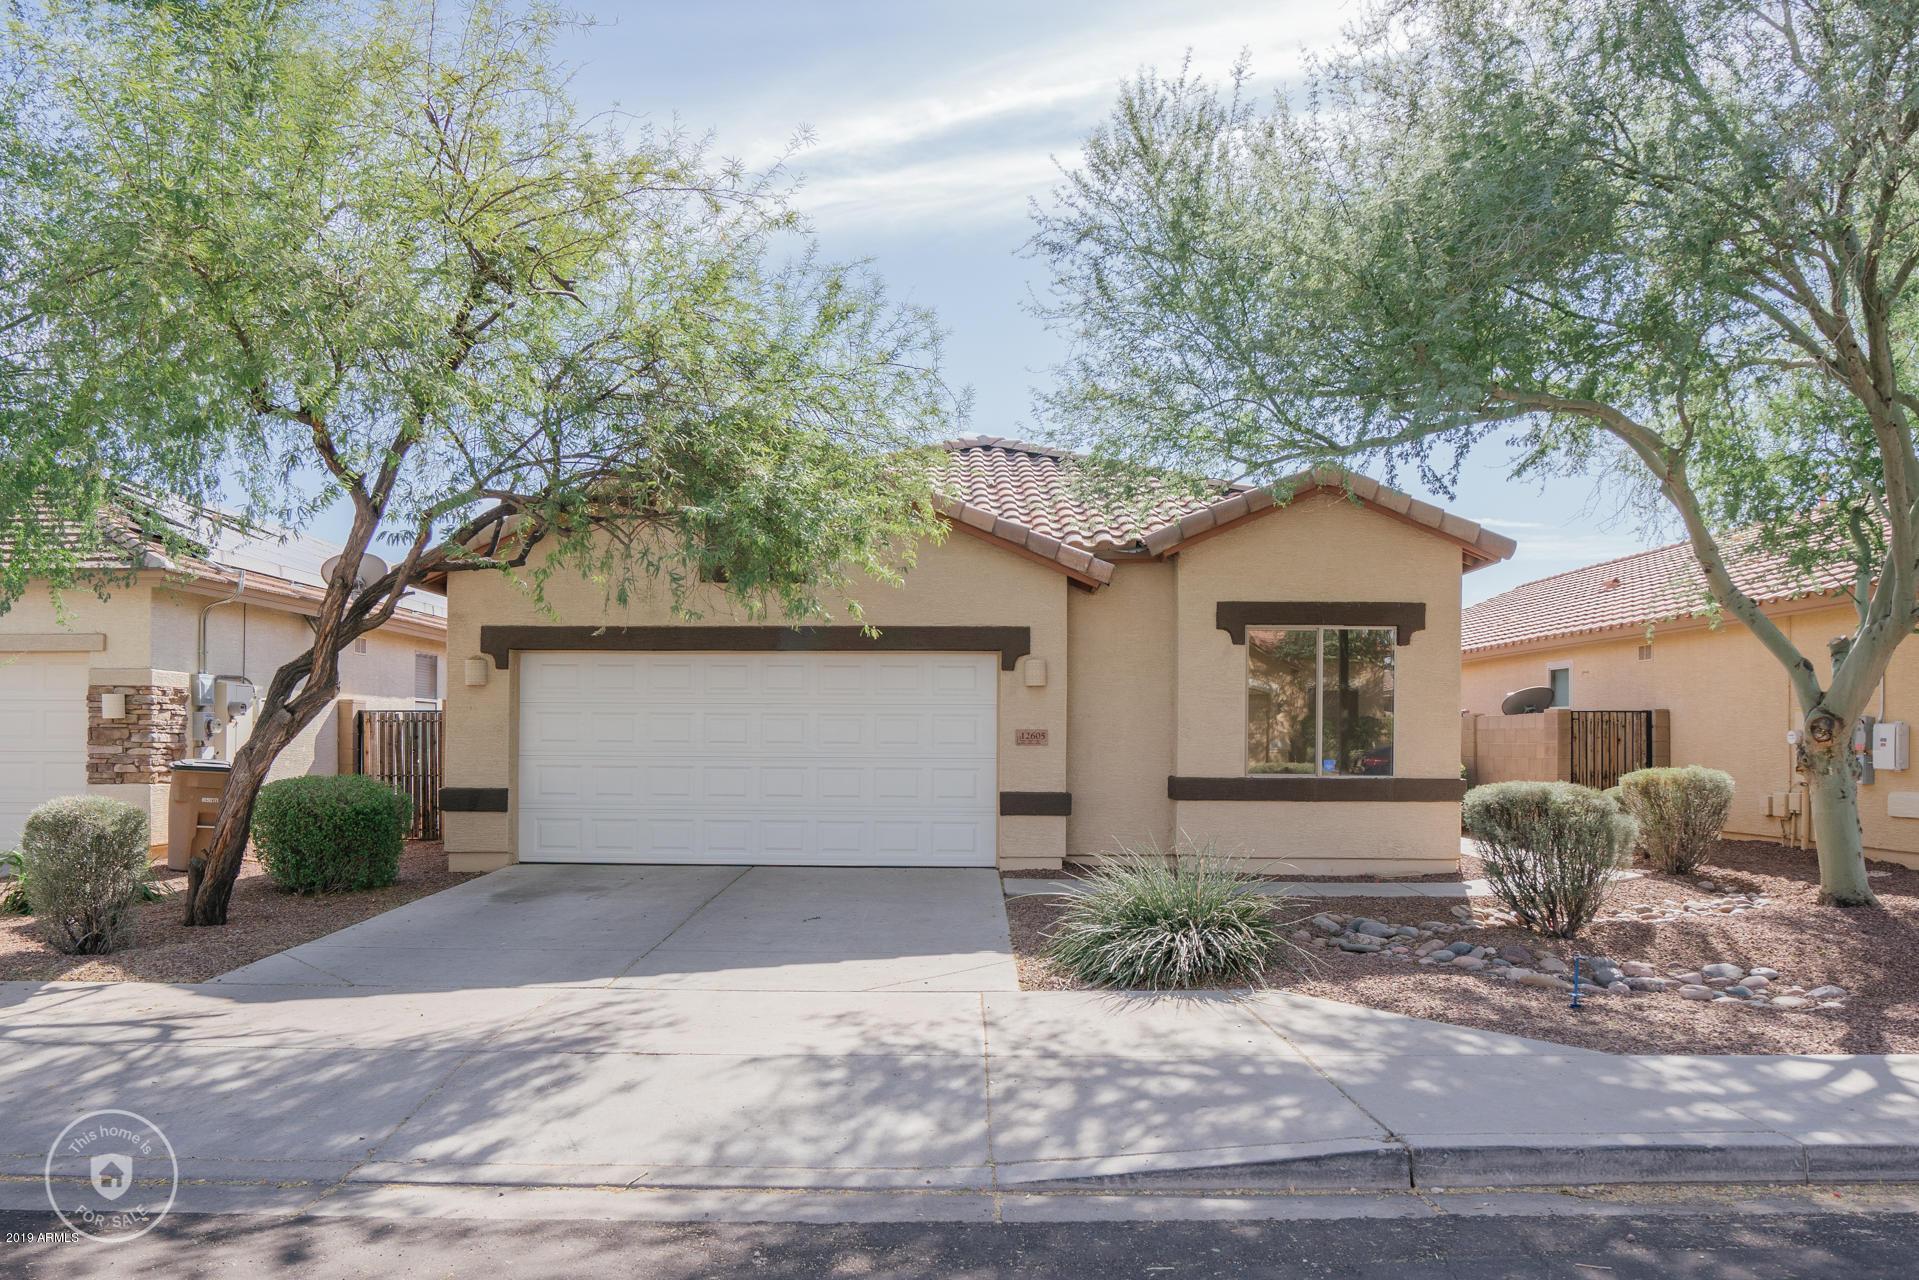 Photo of 12605 W CERCADO Lane, Litchfield Park, AZ 85340